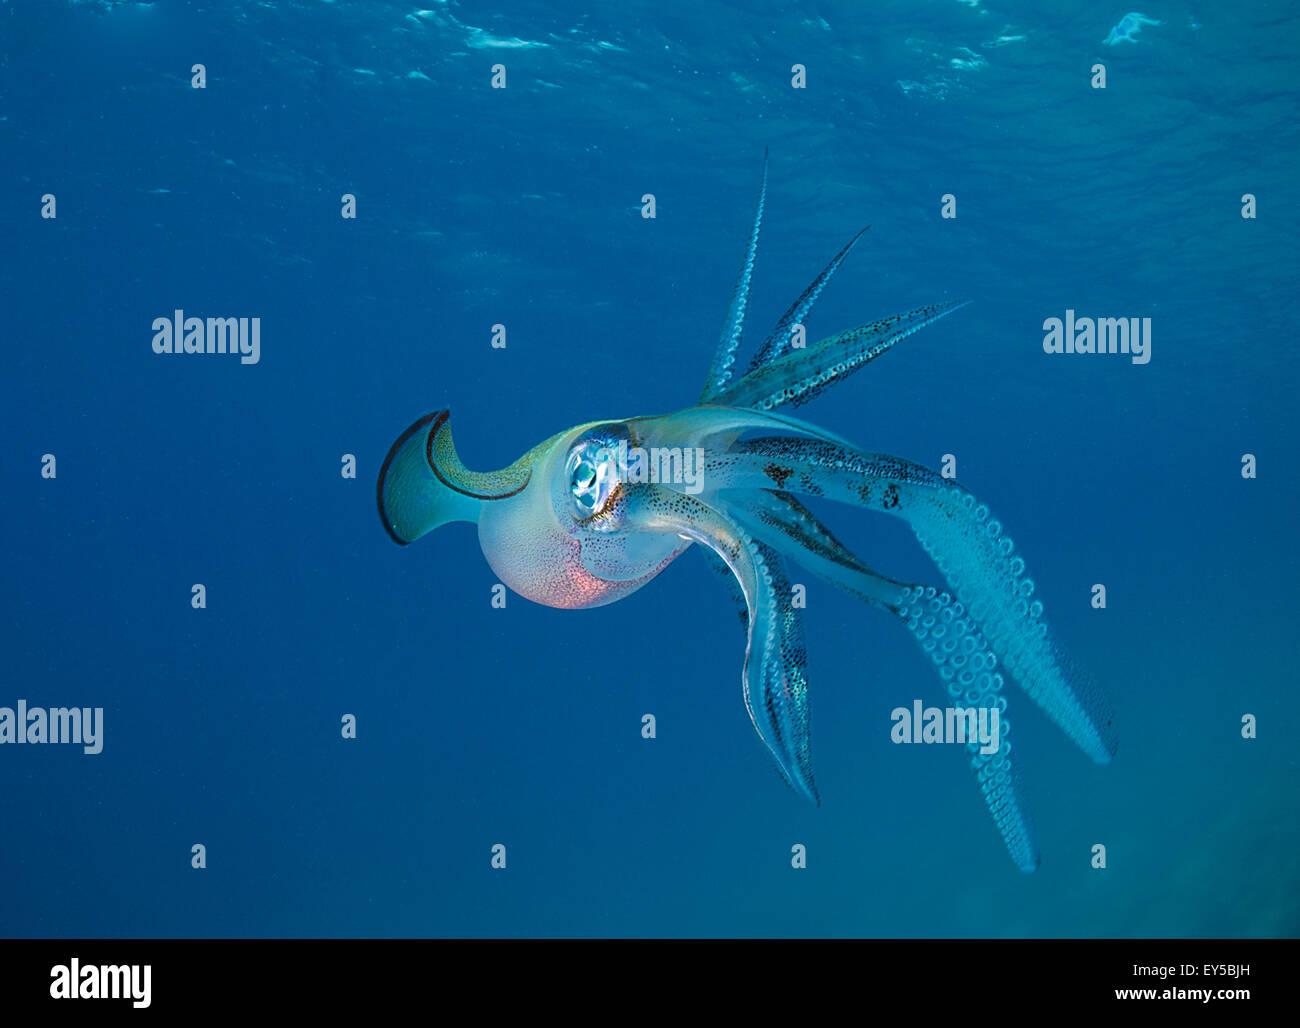 Bigfin reef Squid swimming under surface - Fiji - Stock Image